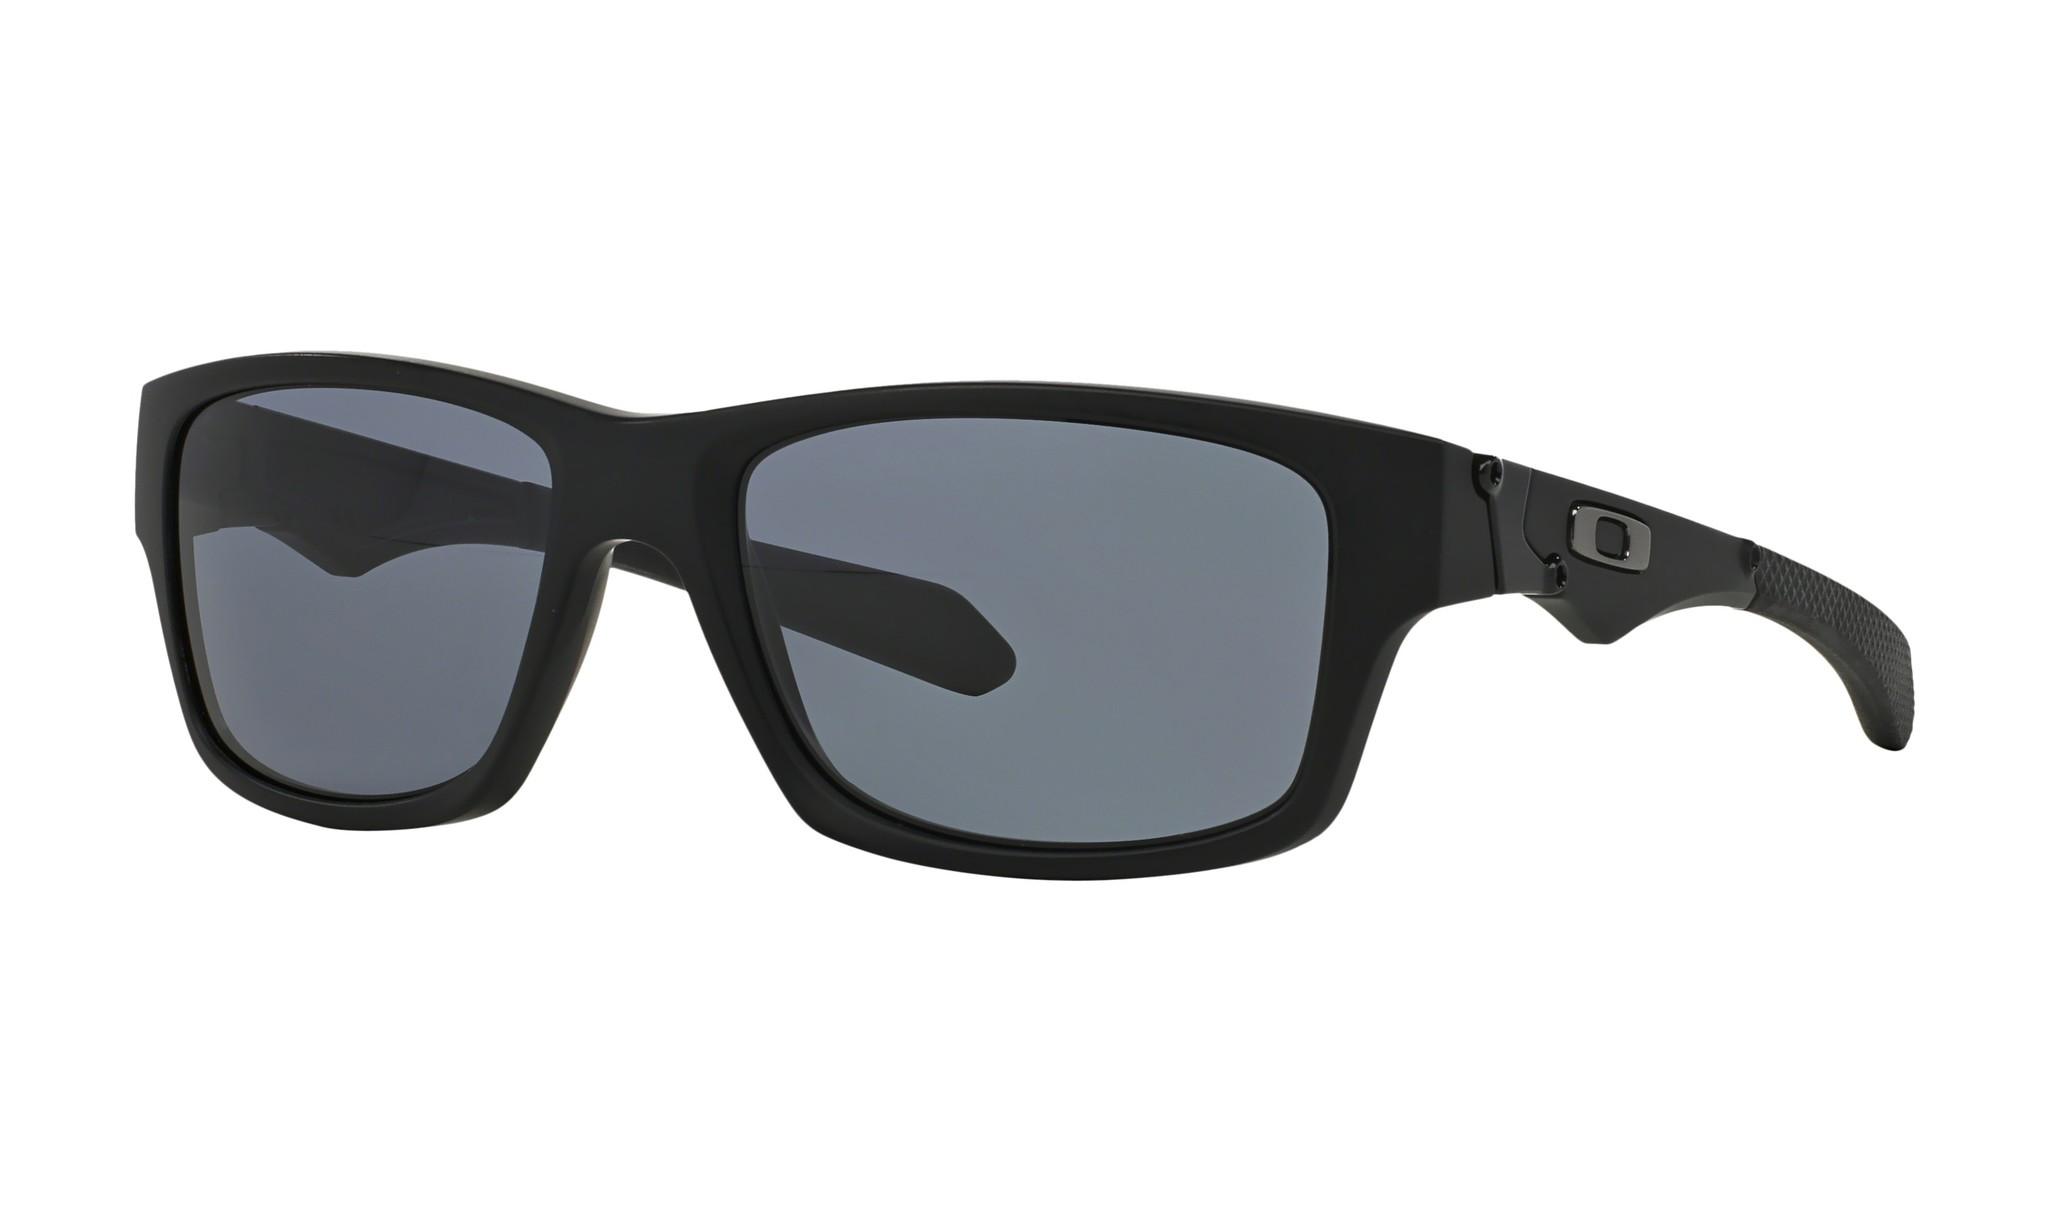 b4649c589dae5 Oakley Jupiter Squared Sunglasses - Matte Black Grey - MODA3